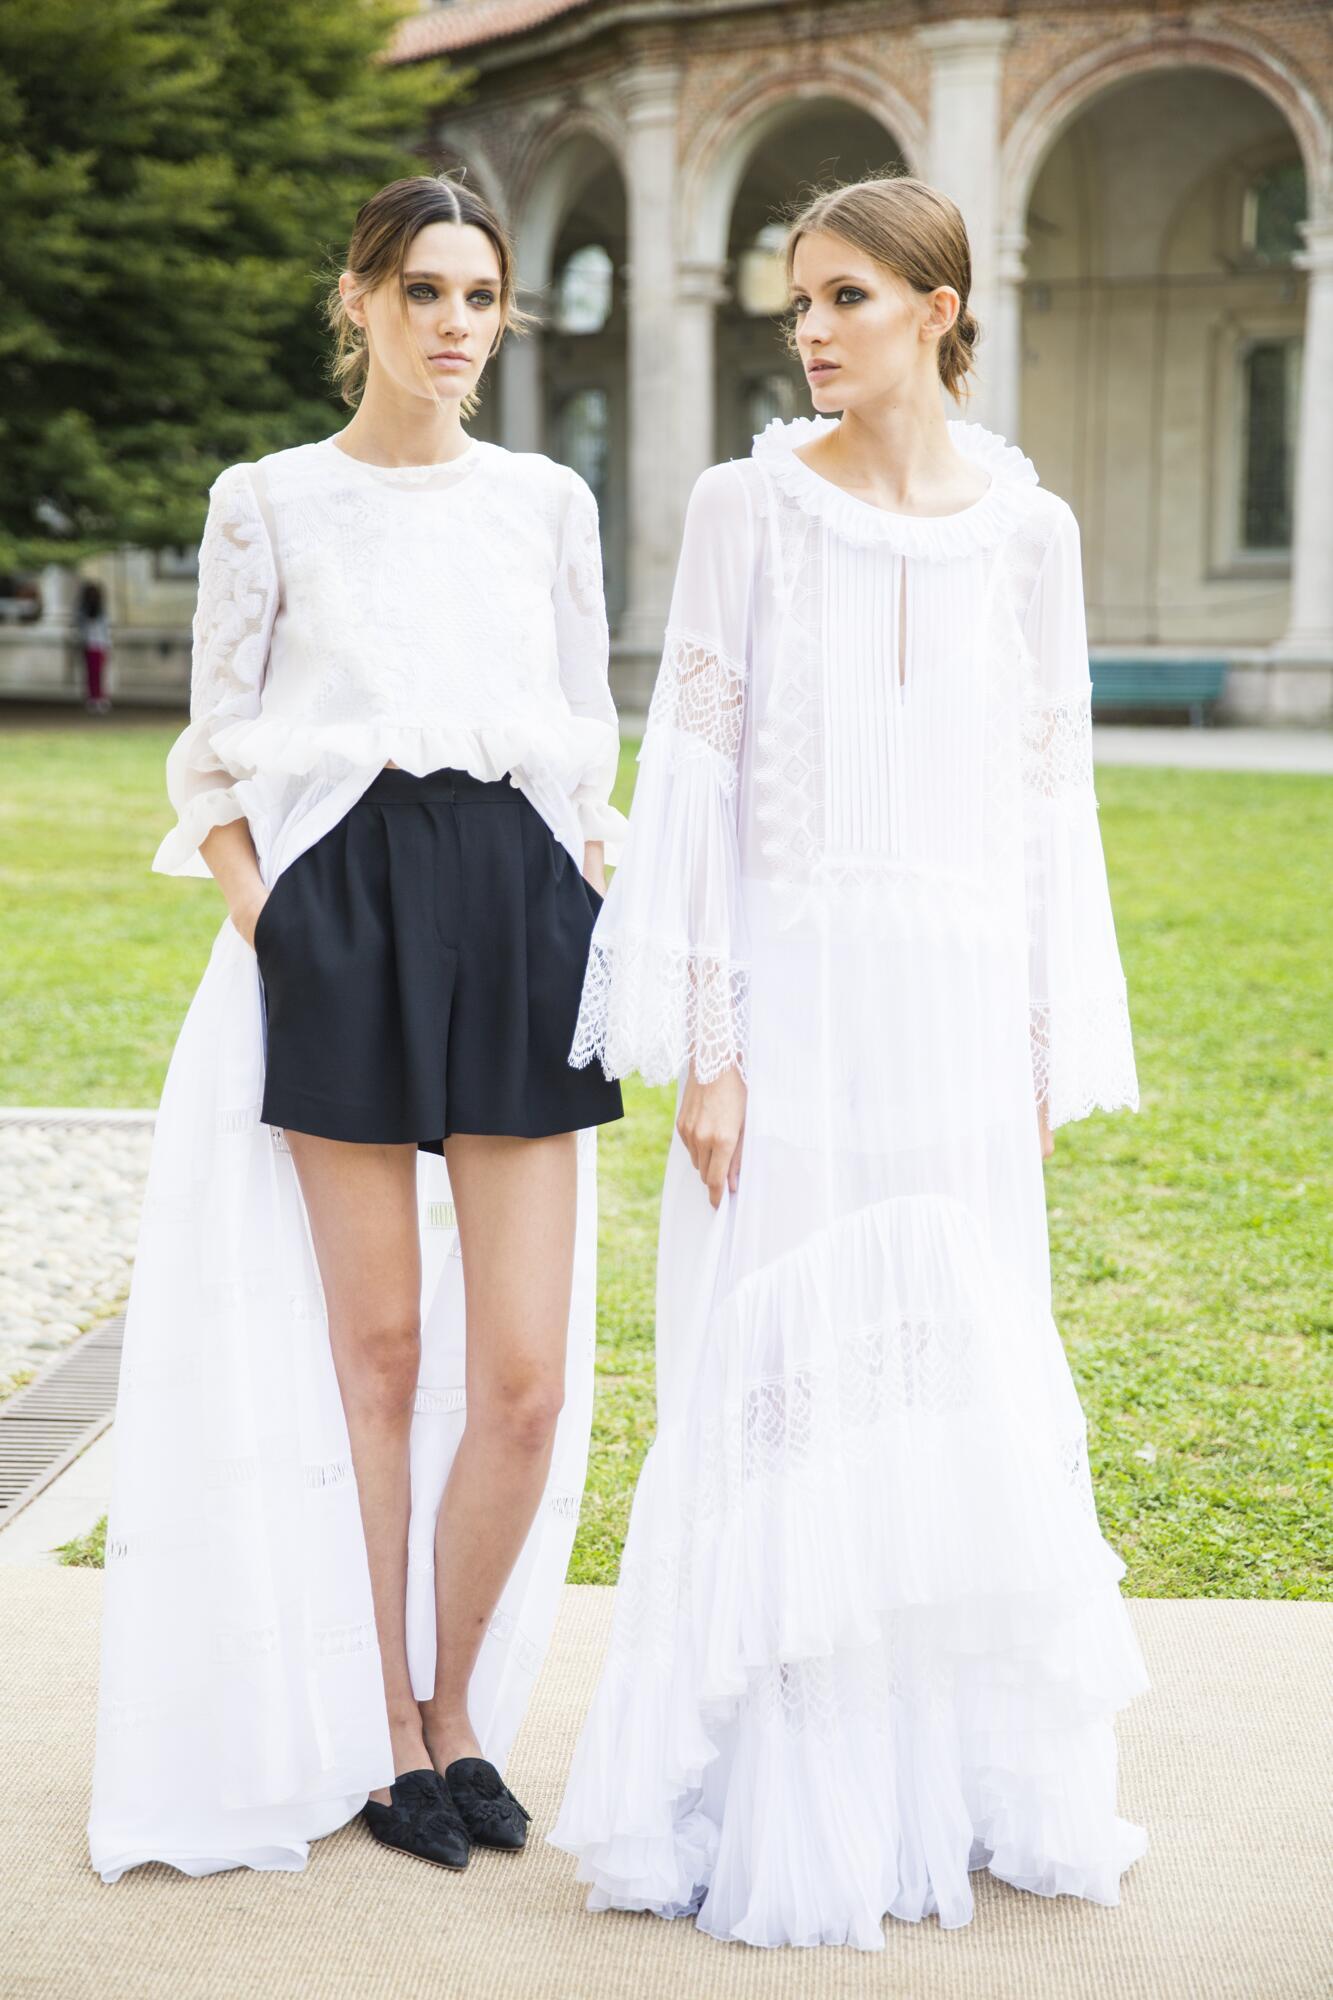 Alberta Ferretti Backstage Fashion Models Womenswear